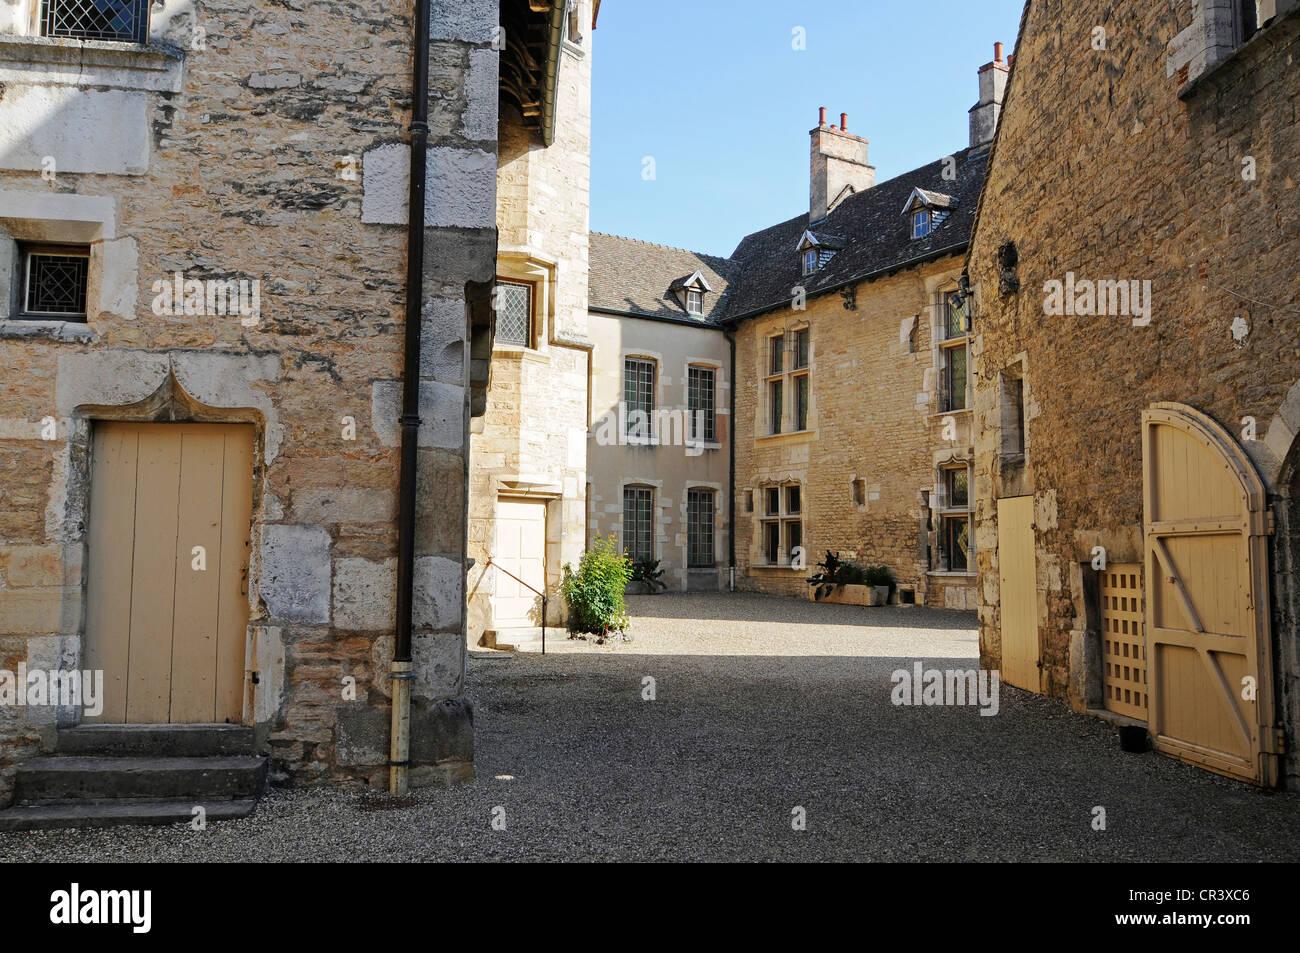 Hotel des Ducs de Bourgogne, wine museum, Beaune, Department Cote-d'Or, Burgundy, France, Europe - Stock Image